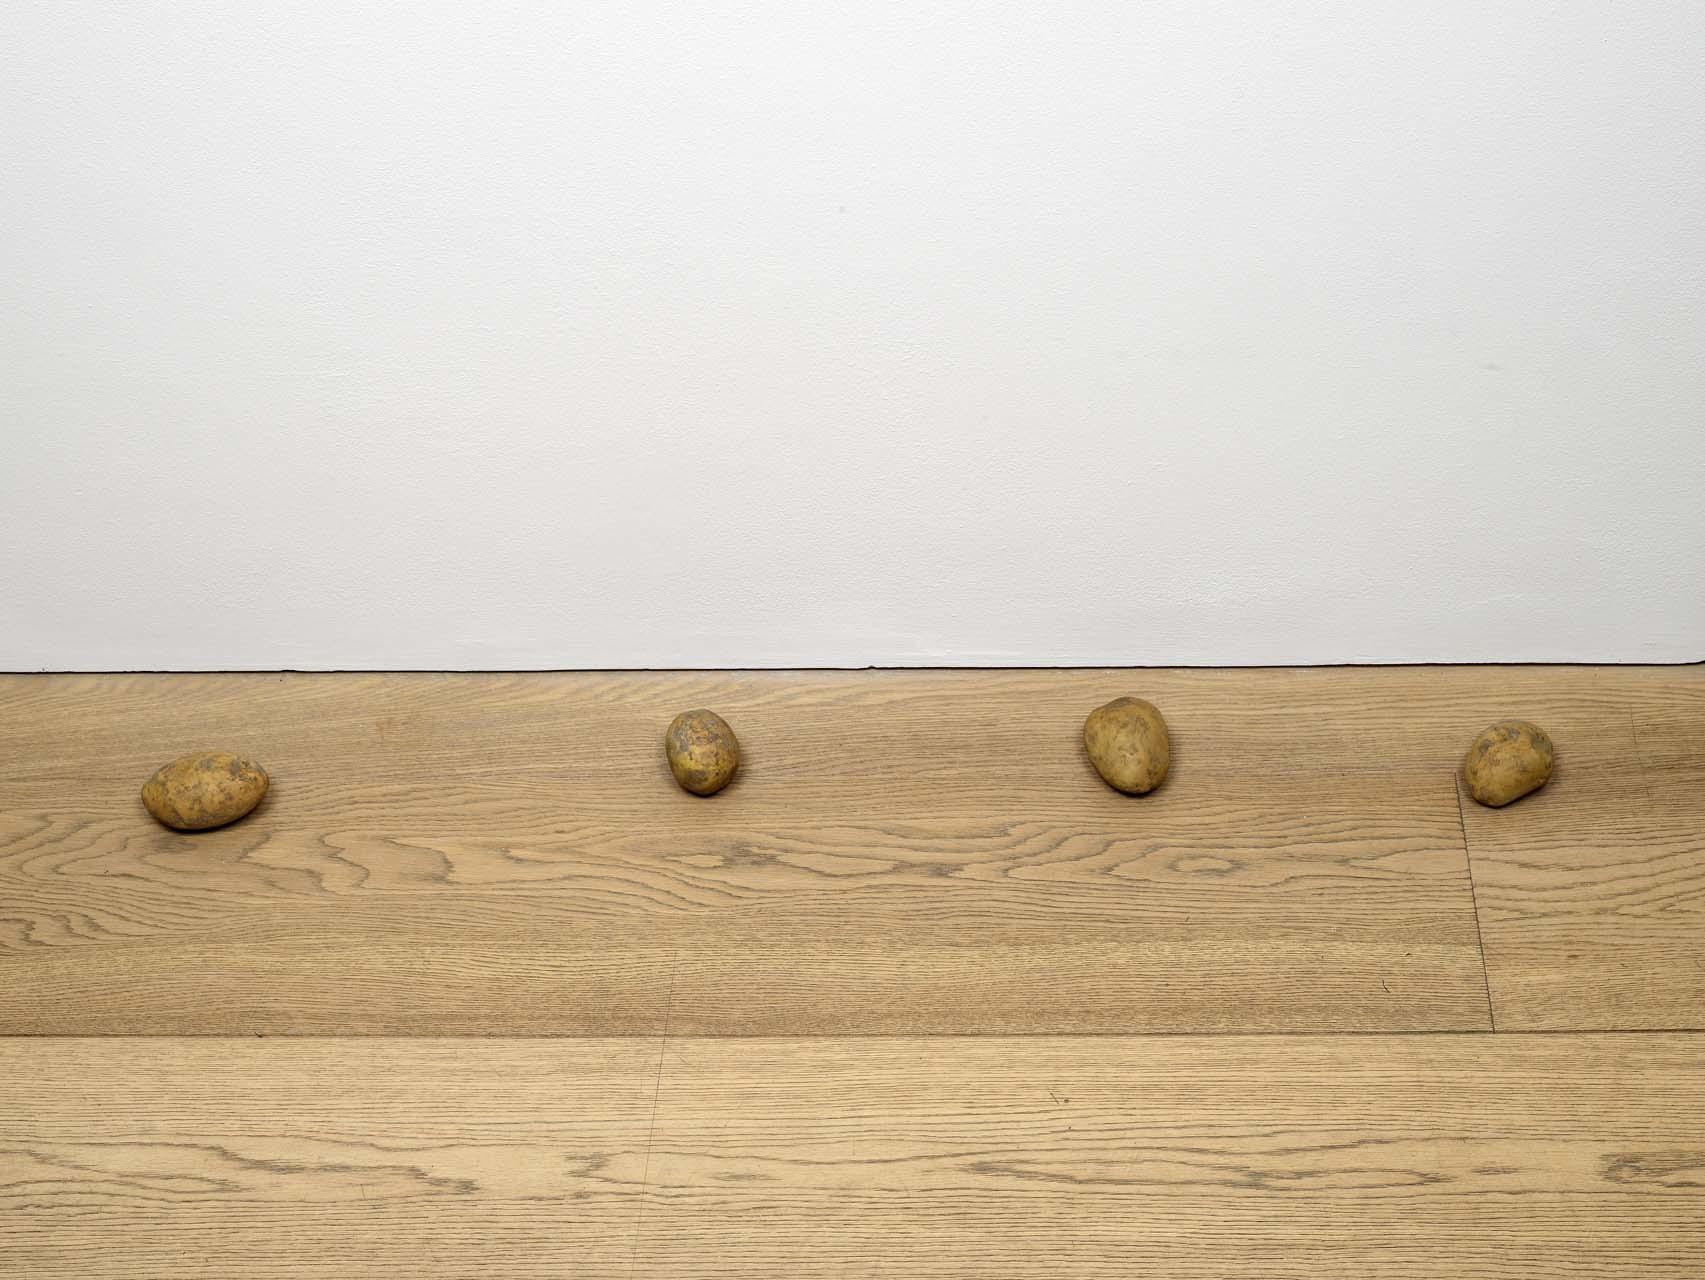 "<div class=""artwork_caption""><p>still.life. (four potatoes in a line), 2009</p></div>"